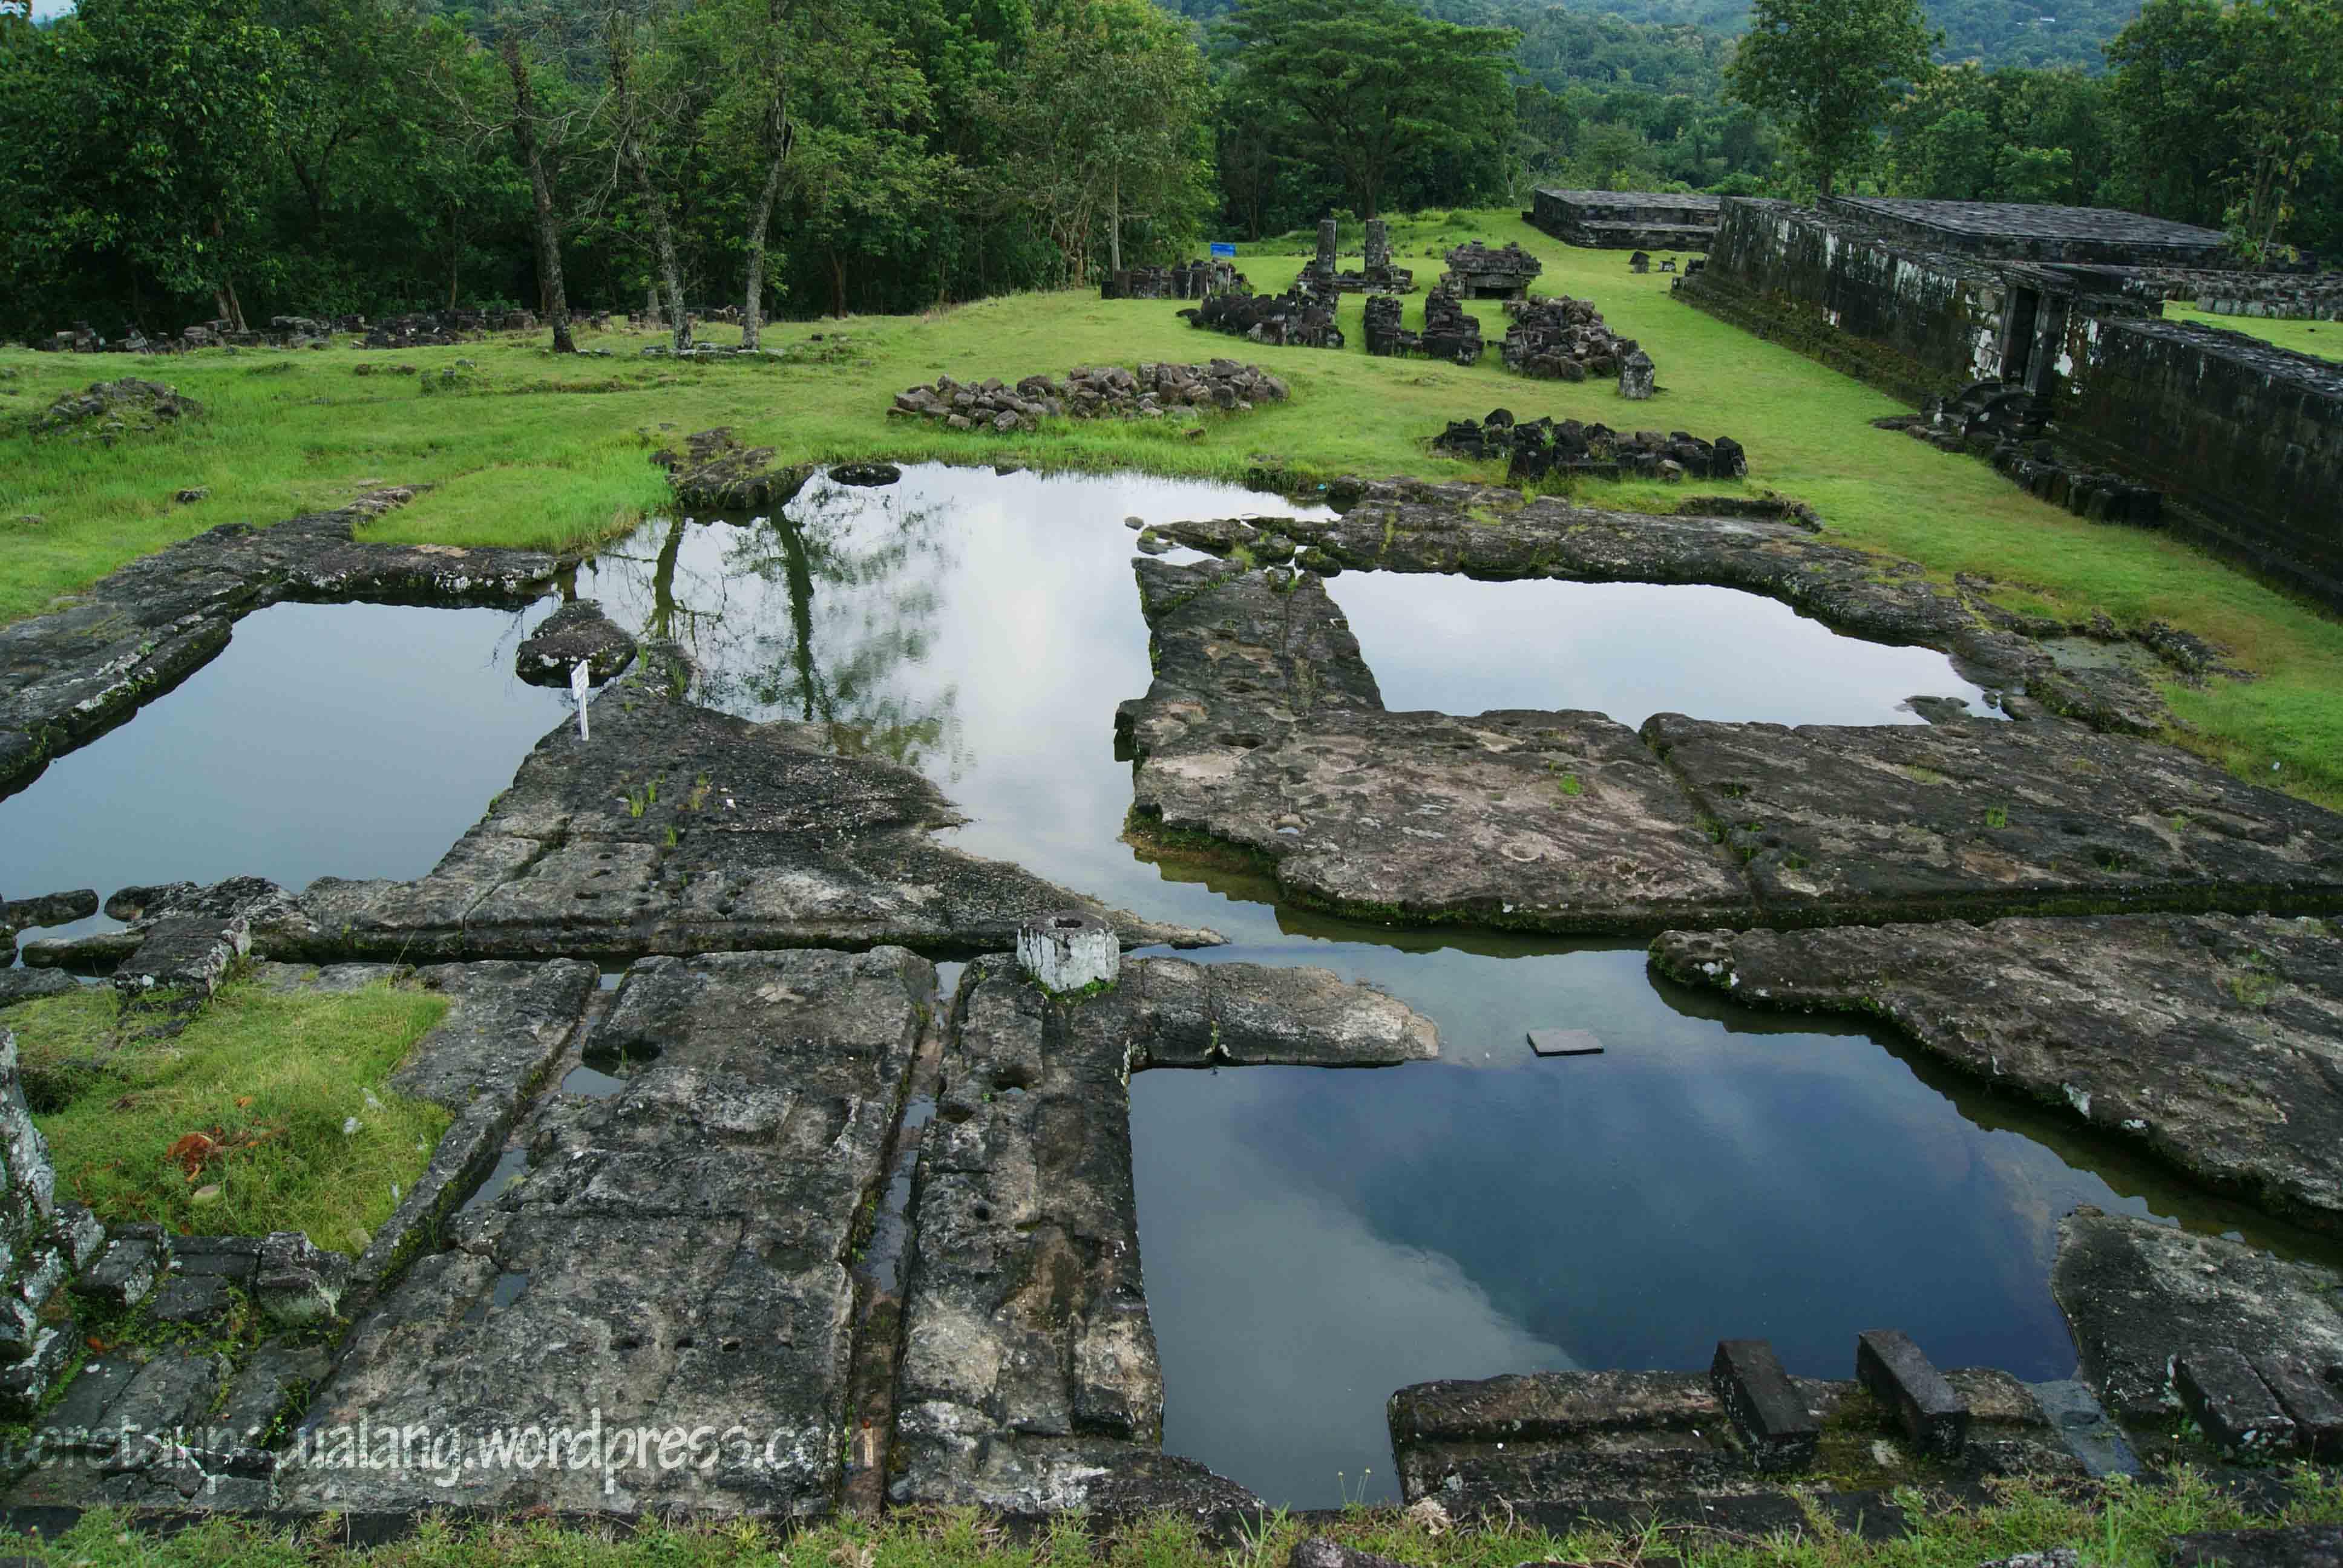 Candi Ratu Boko Istana Megah Atas Bukit Coretanpetualang Blog Setelah